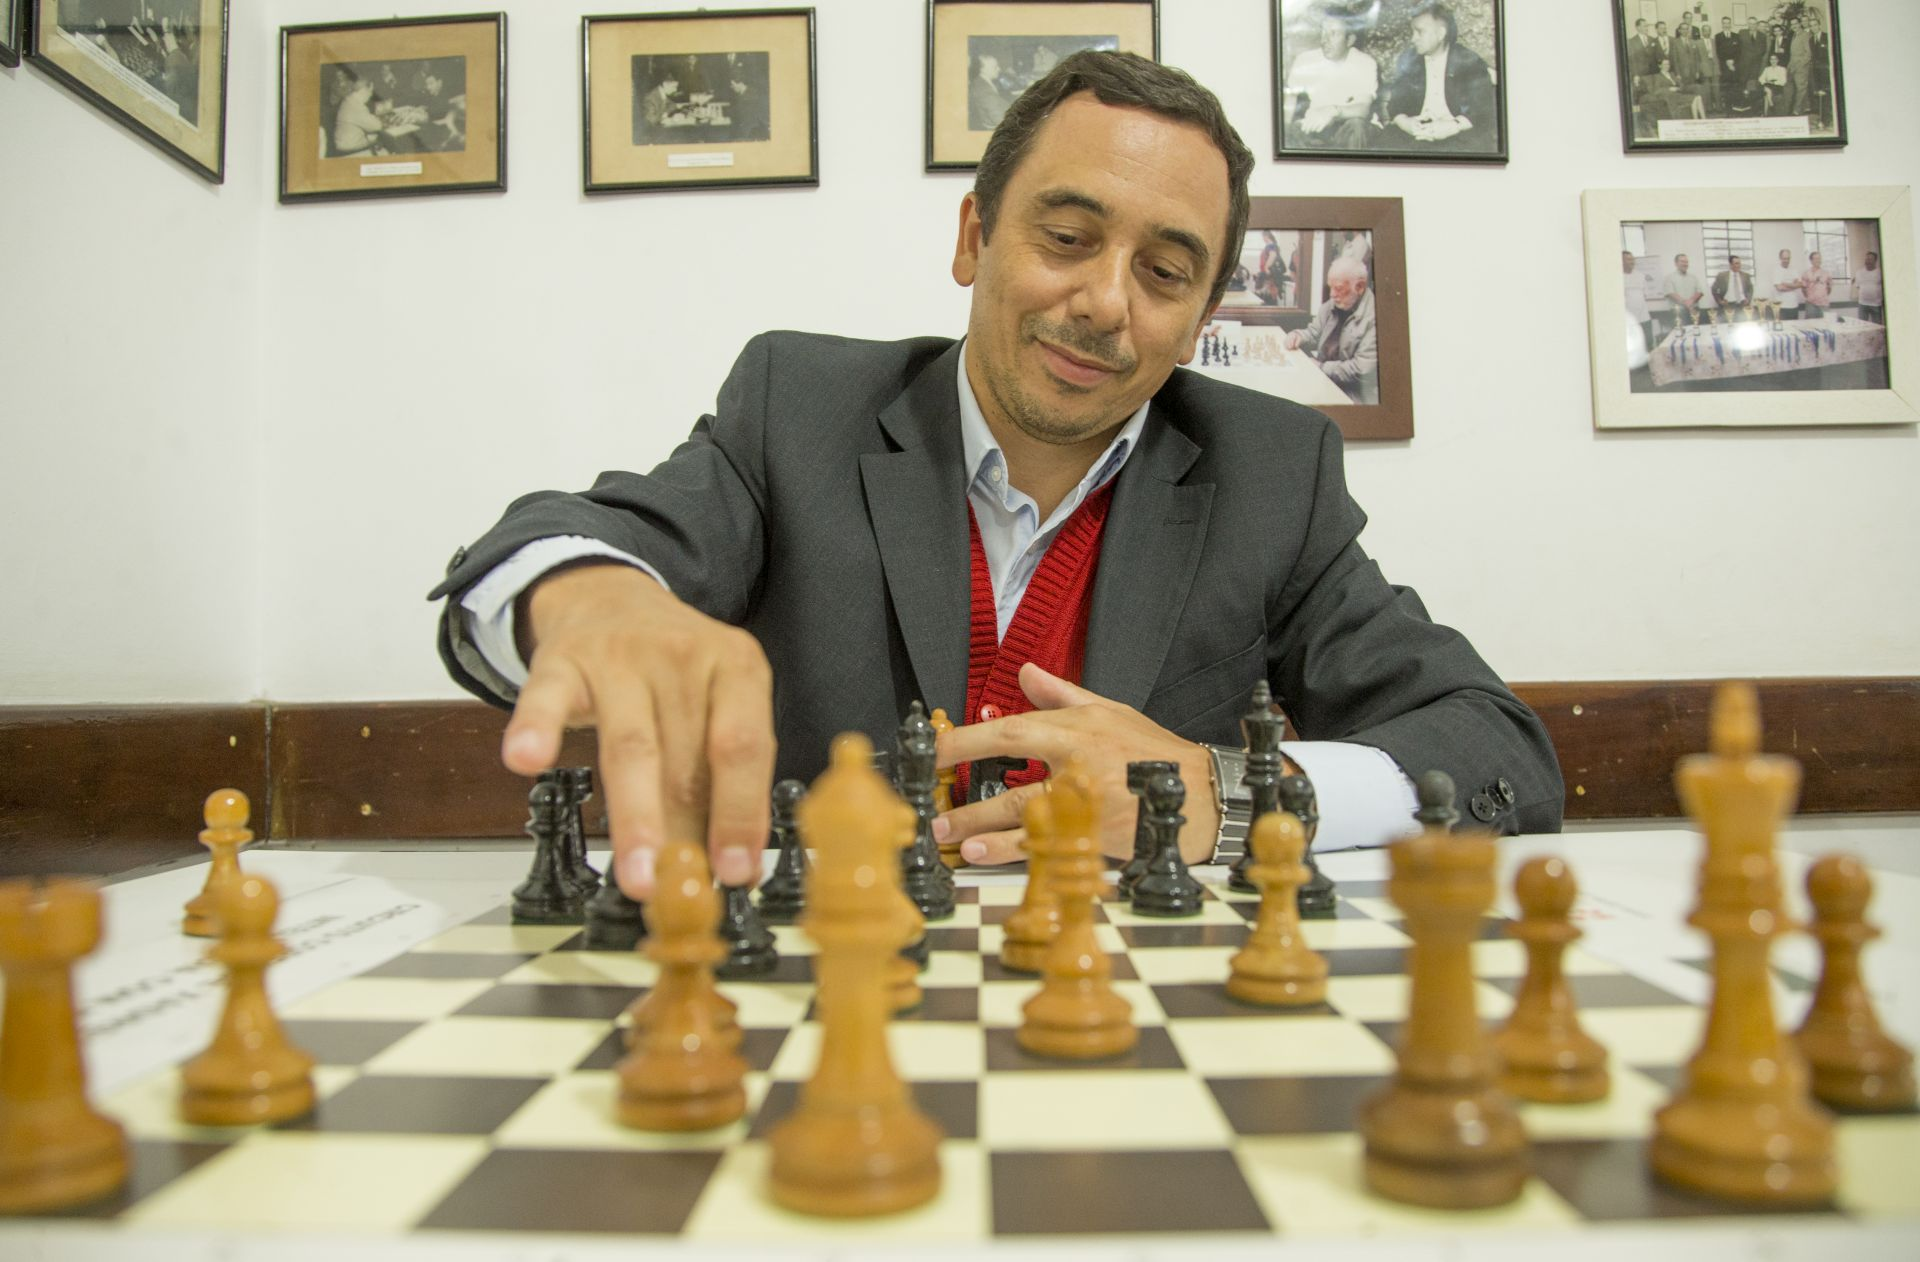 O presidente do Clube de Xadrez de Curitiba. Foto: Hugo Harada/Gazeta do Povo.